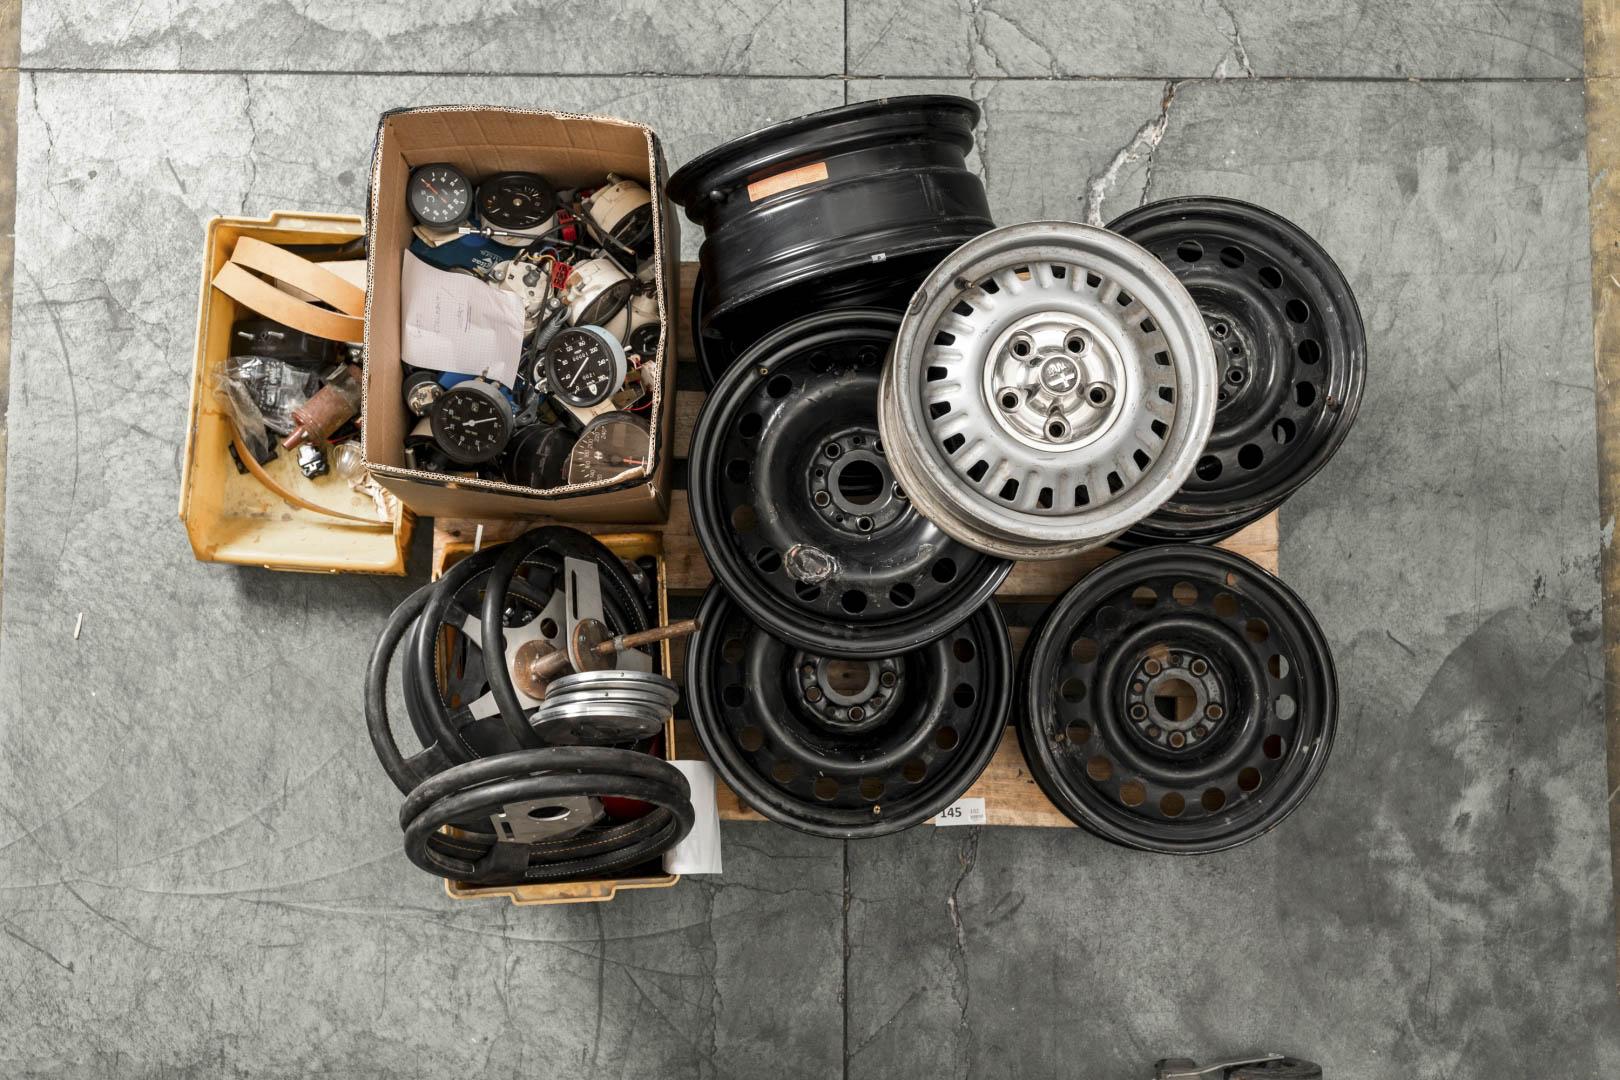 Bertone Spare parts from Stile Bertone workshop 1970's-2000's